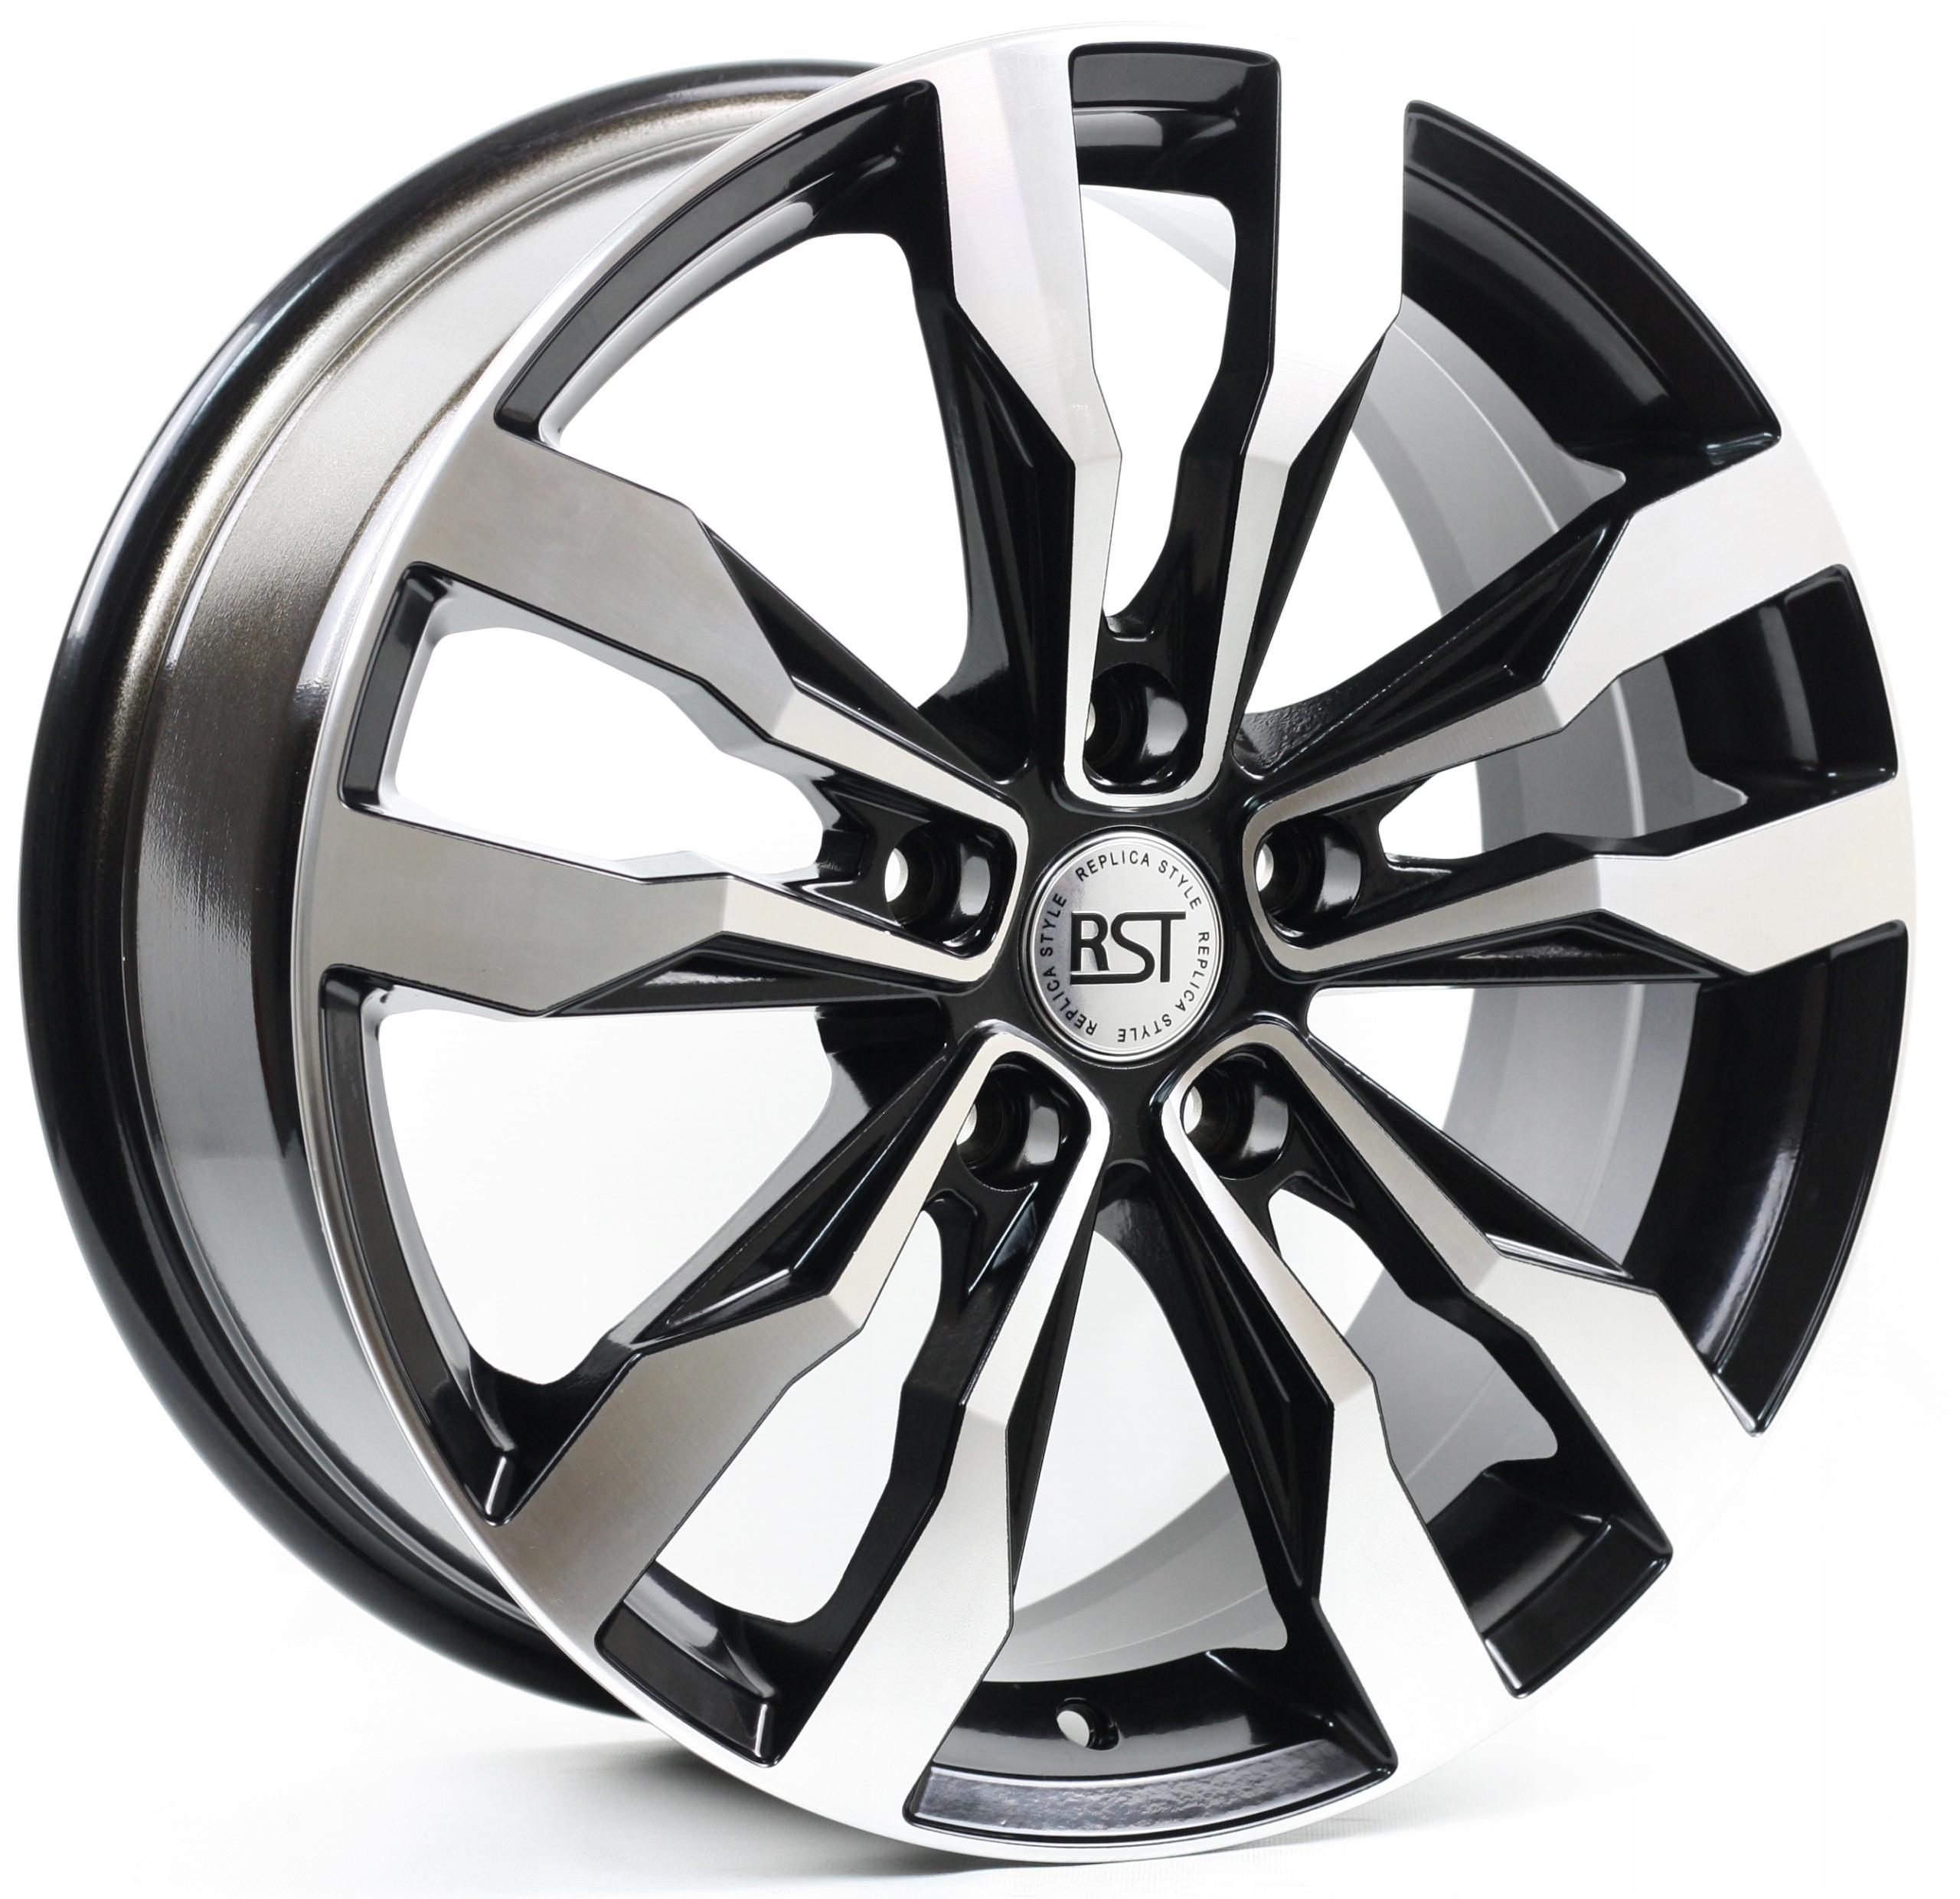 Легкосплавные диски 17 Peugeot 5x108 308508407 3008 5008